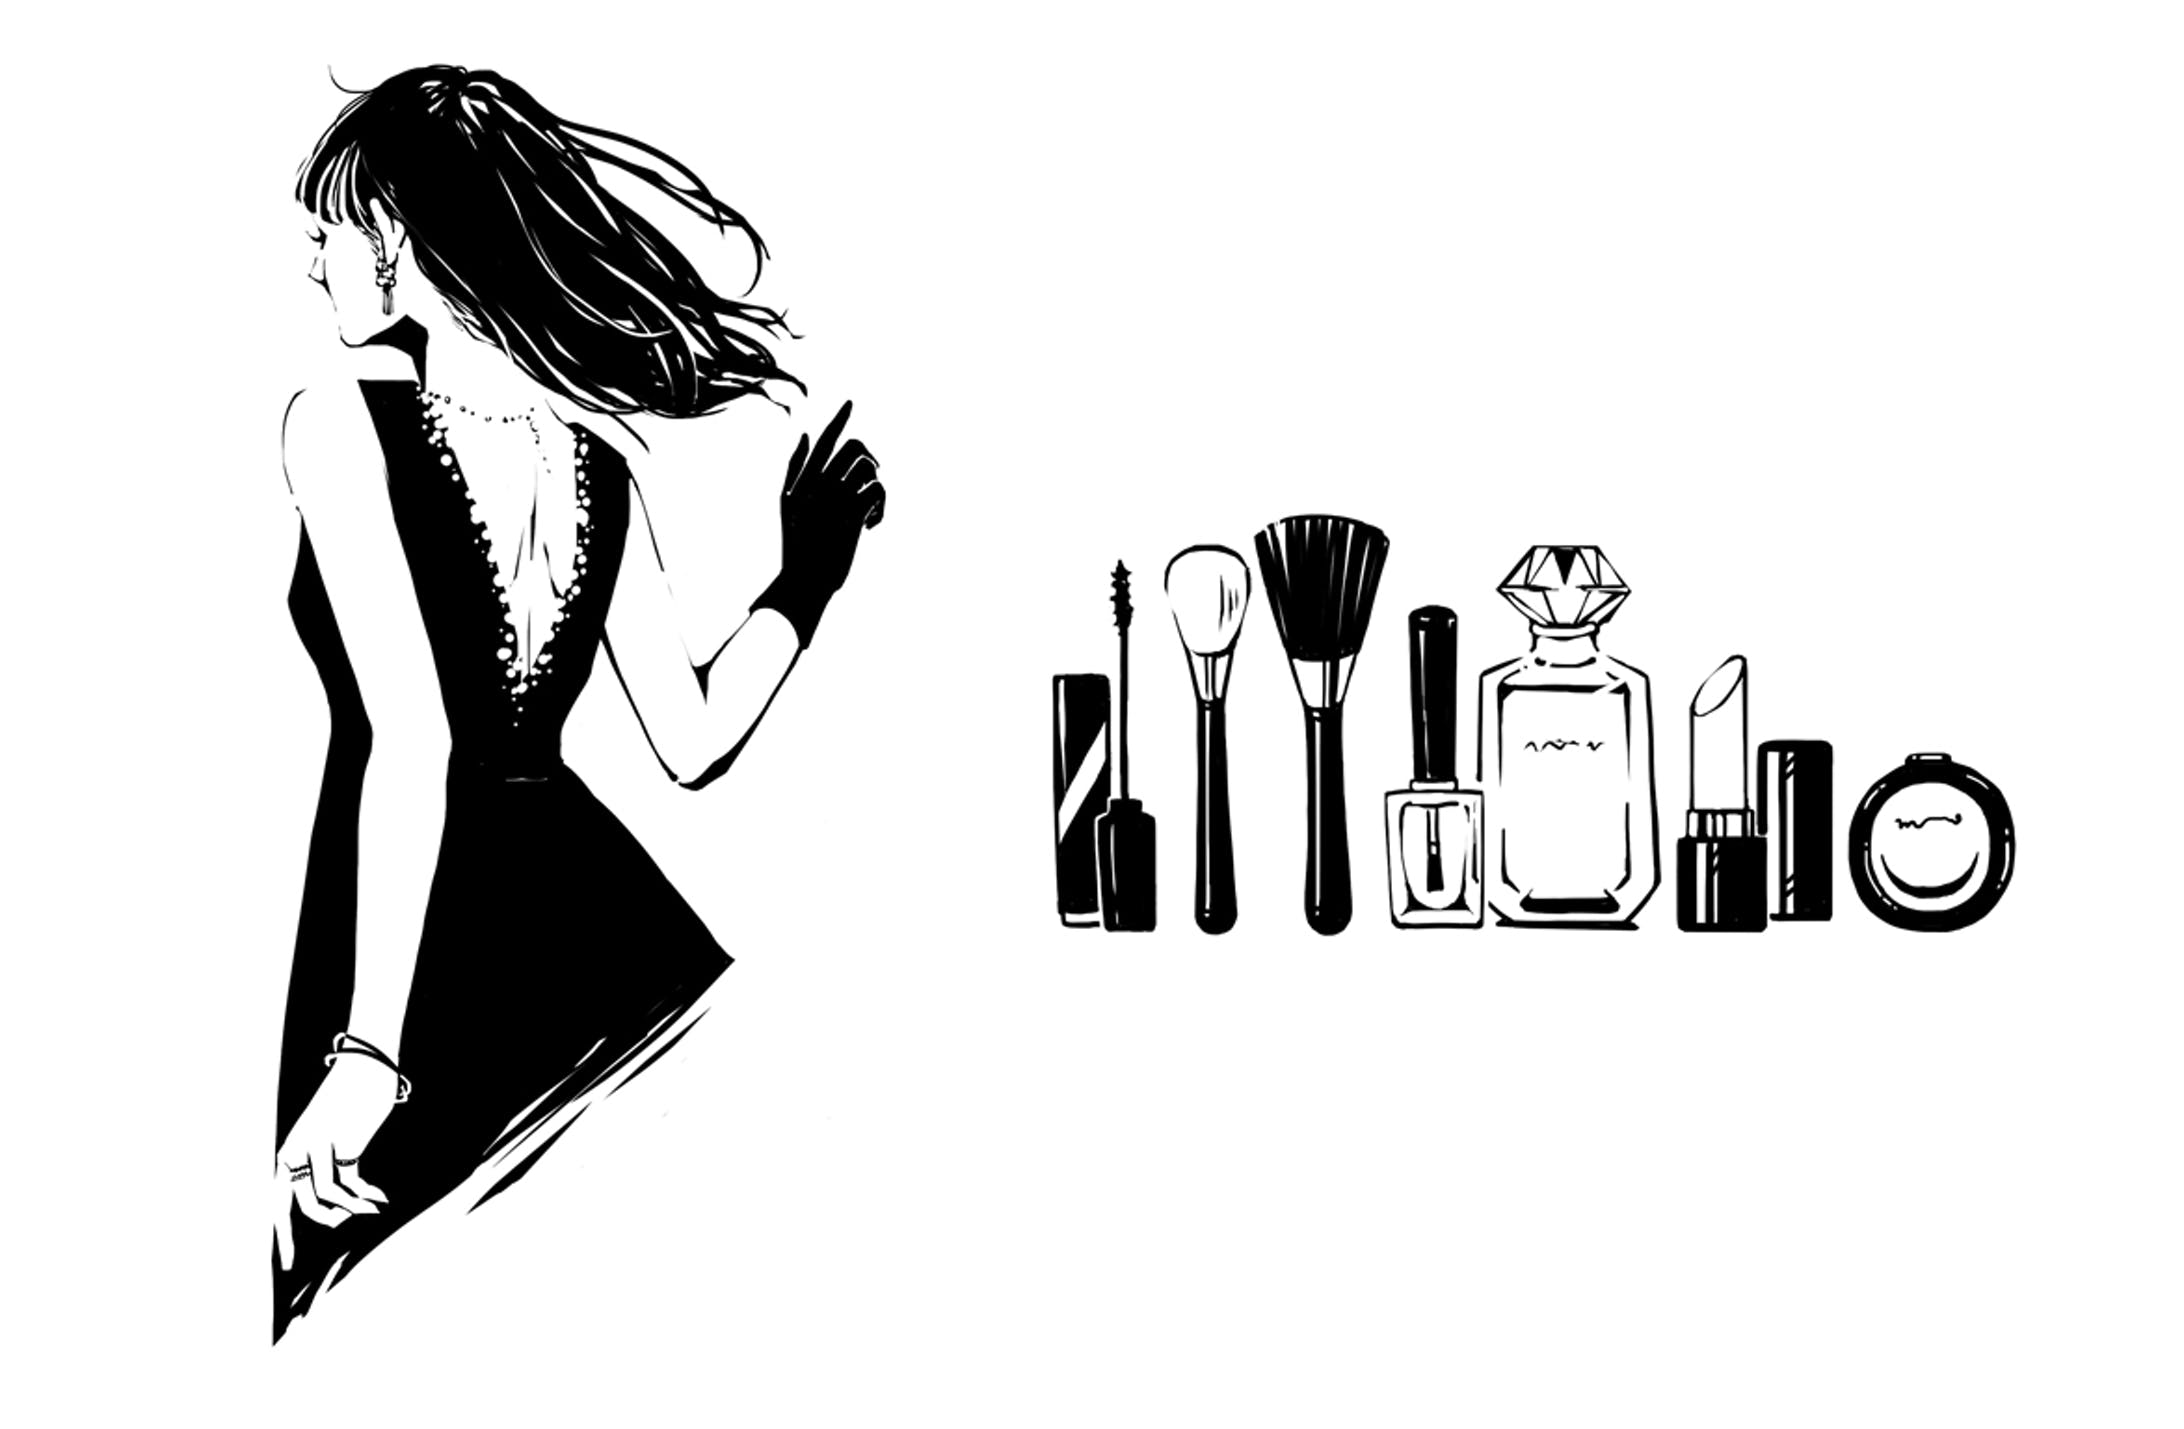 【WORK】装画 「運命をこっそり変える」/ セブン&アイ出版-1